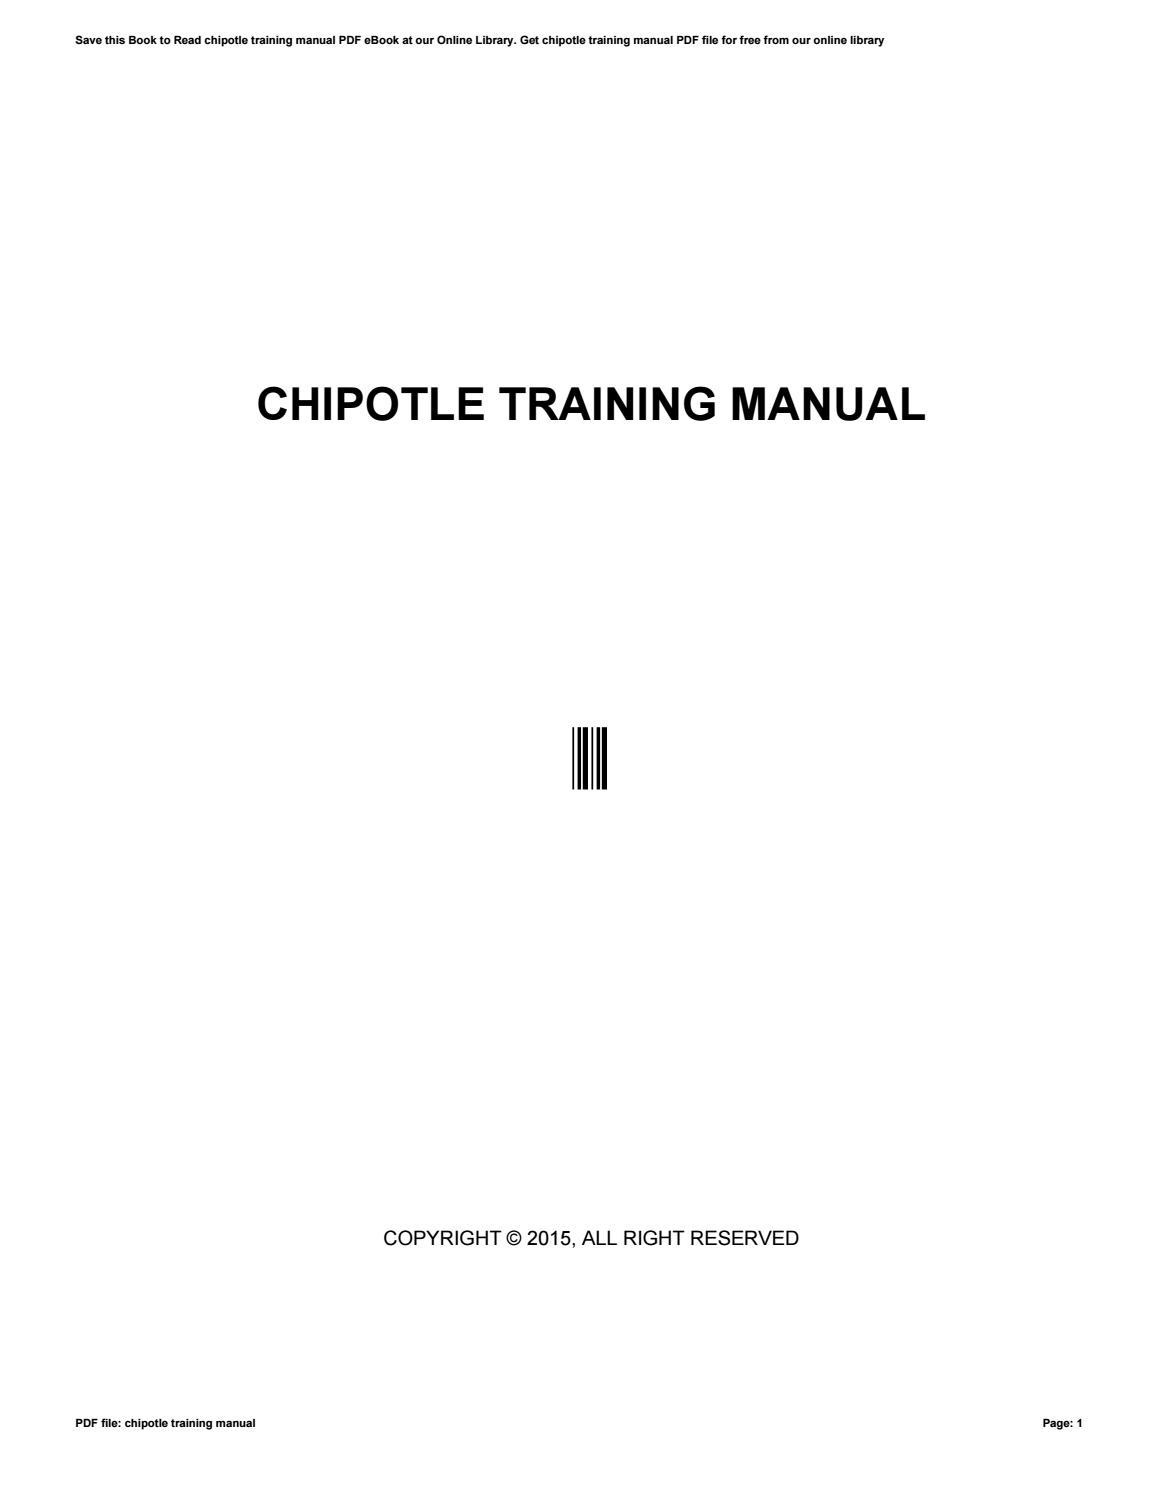 chipotle training manual by maildx11 issuu rh issuu com Training Manual Clip Art chipotle employee training manual